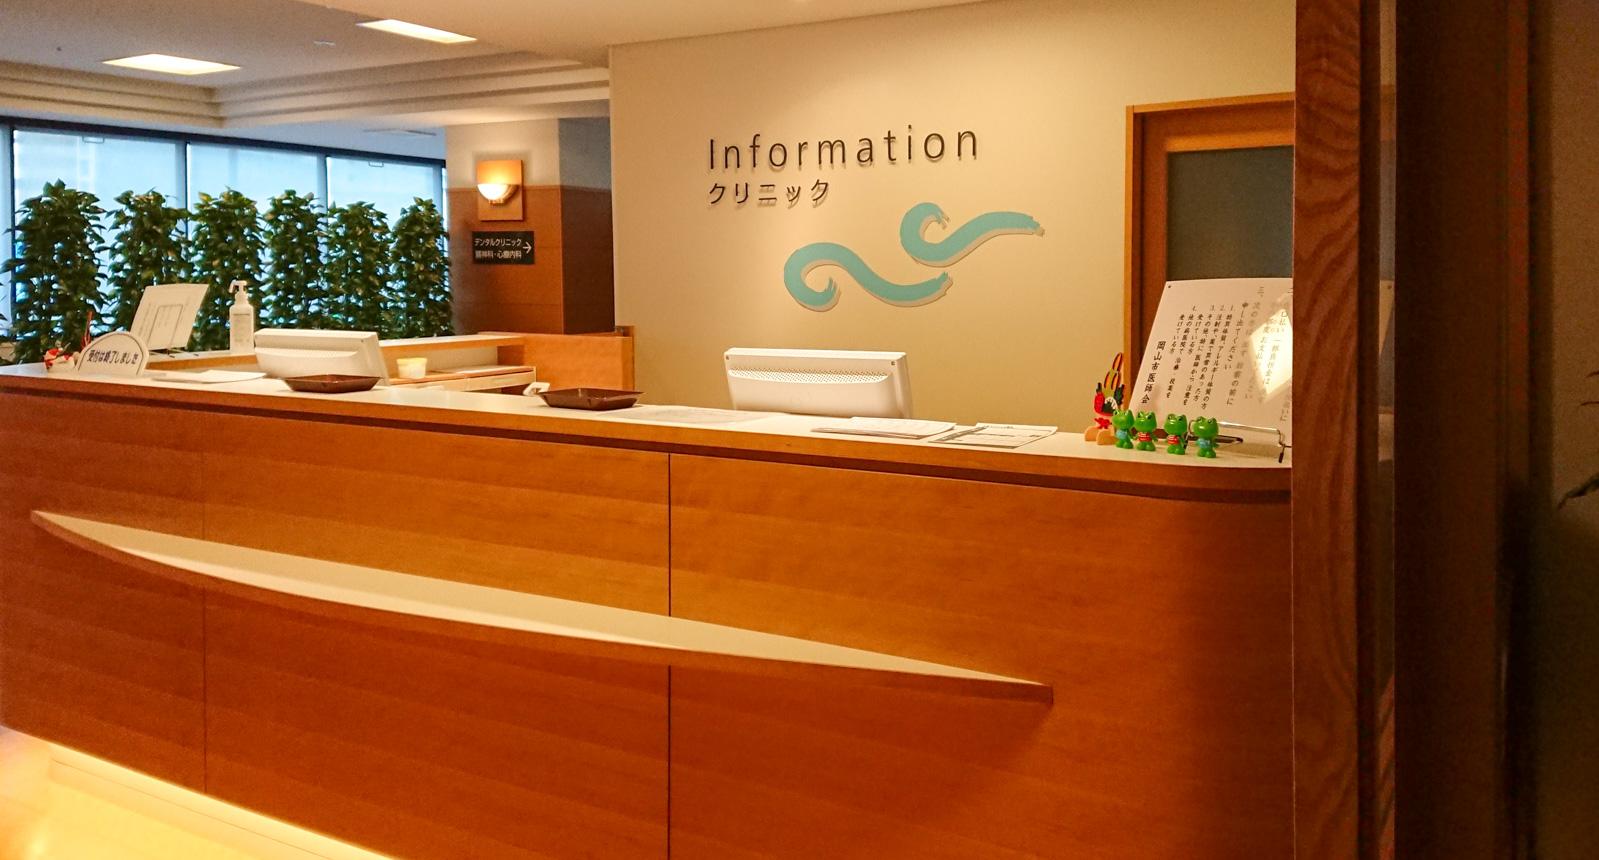 J検診センター